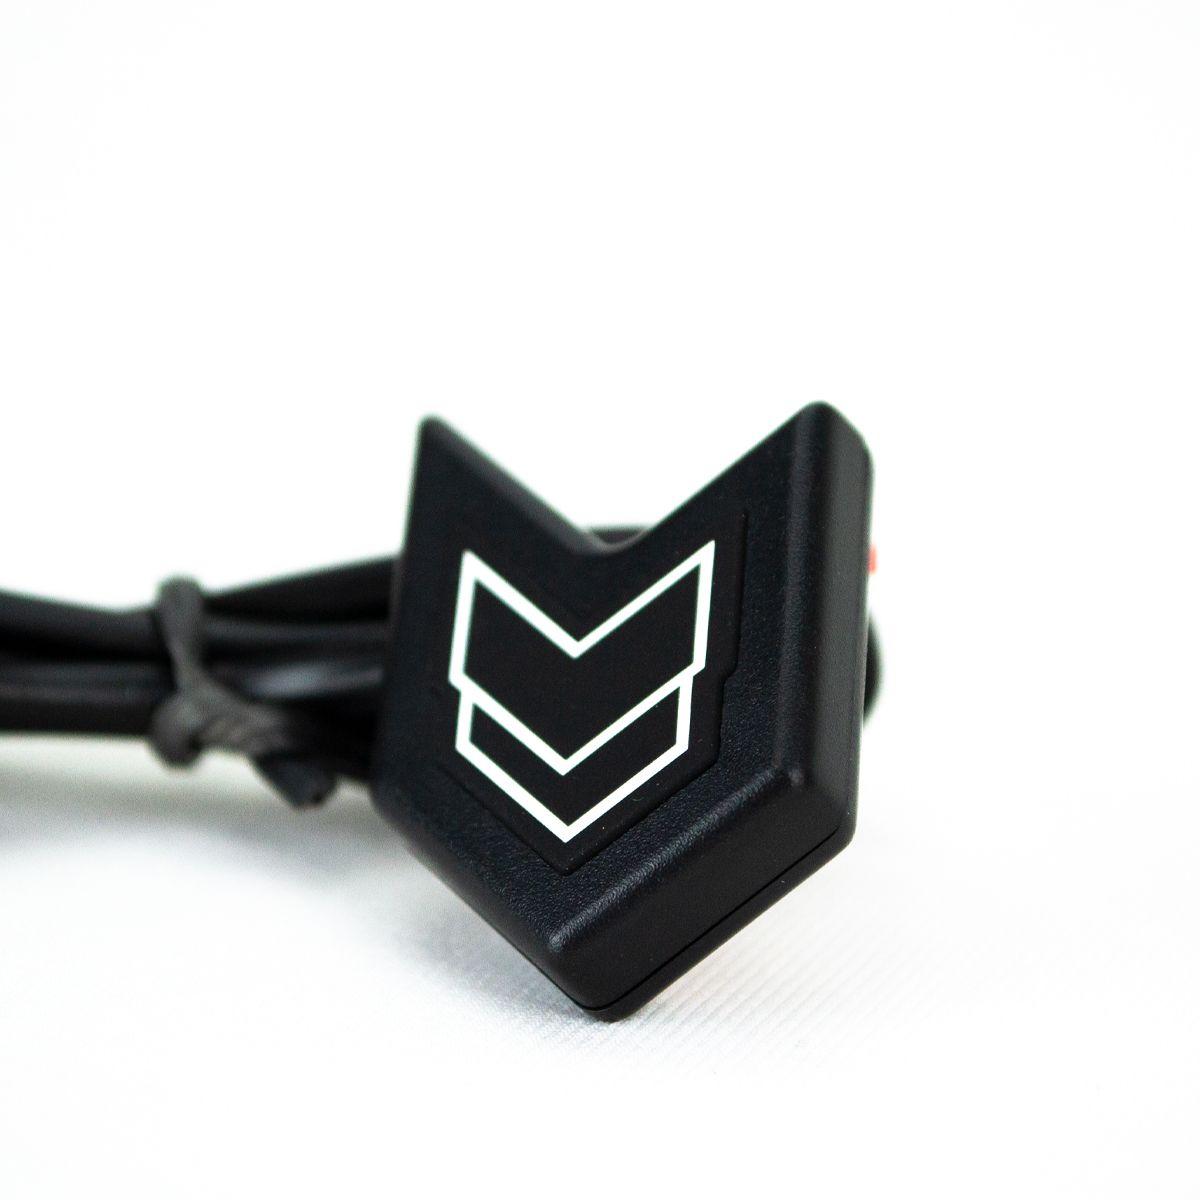 Chip de Pedal Shiftpower Para Mitsubishi L200